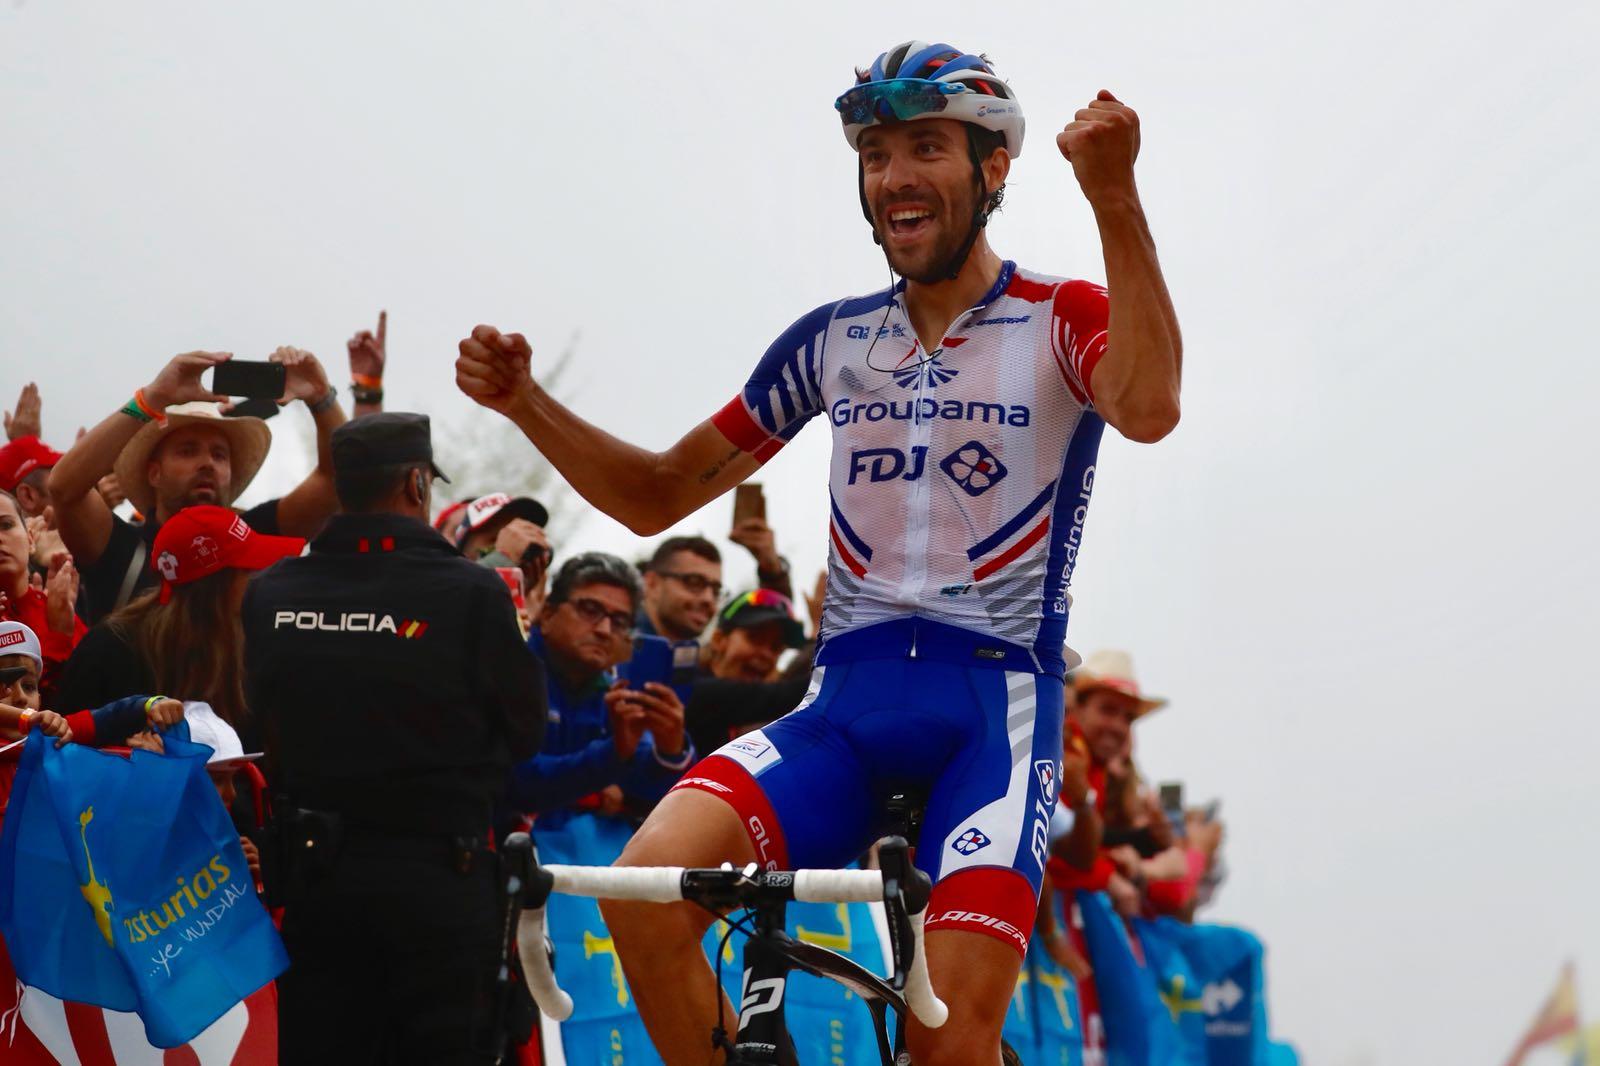 Thibaut Pinot vince la quindicesima tappa del Tour de France